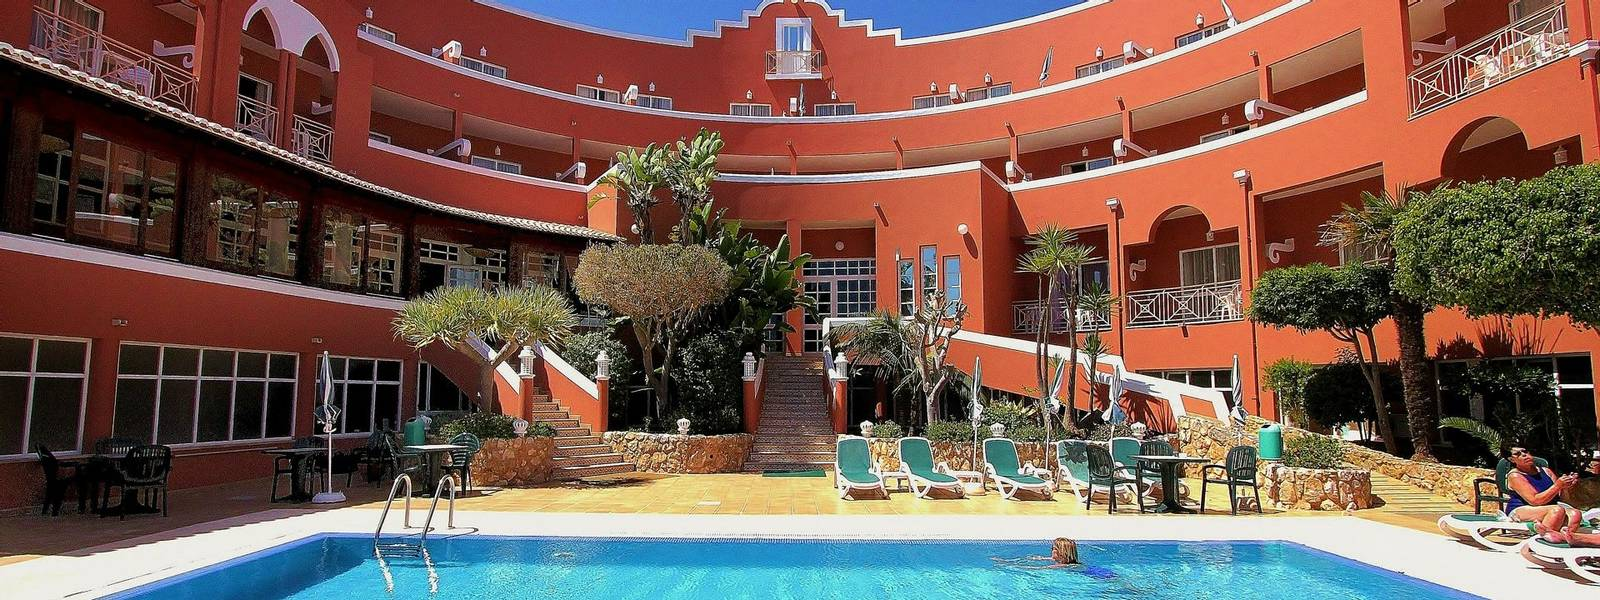 Hotel Belavista - scroll-00_25846049082_o.jpg